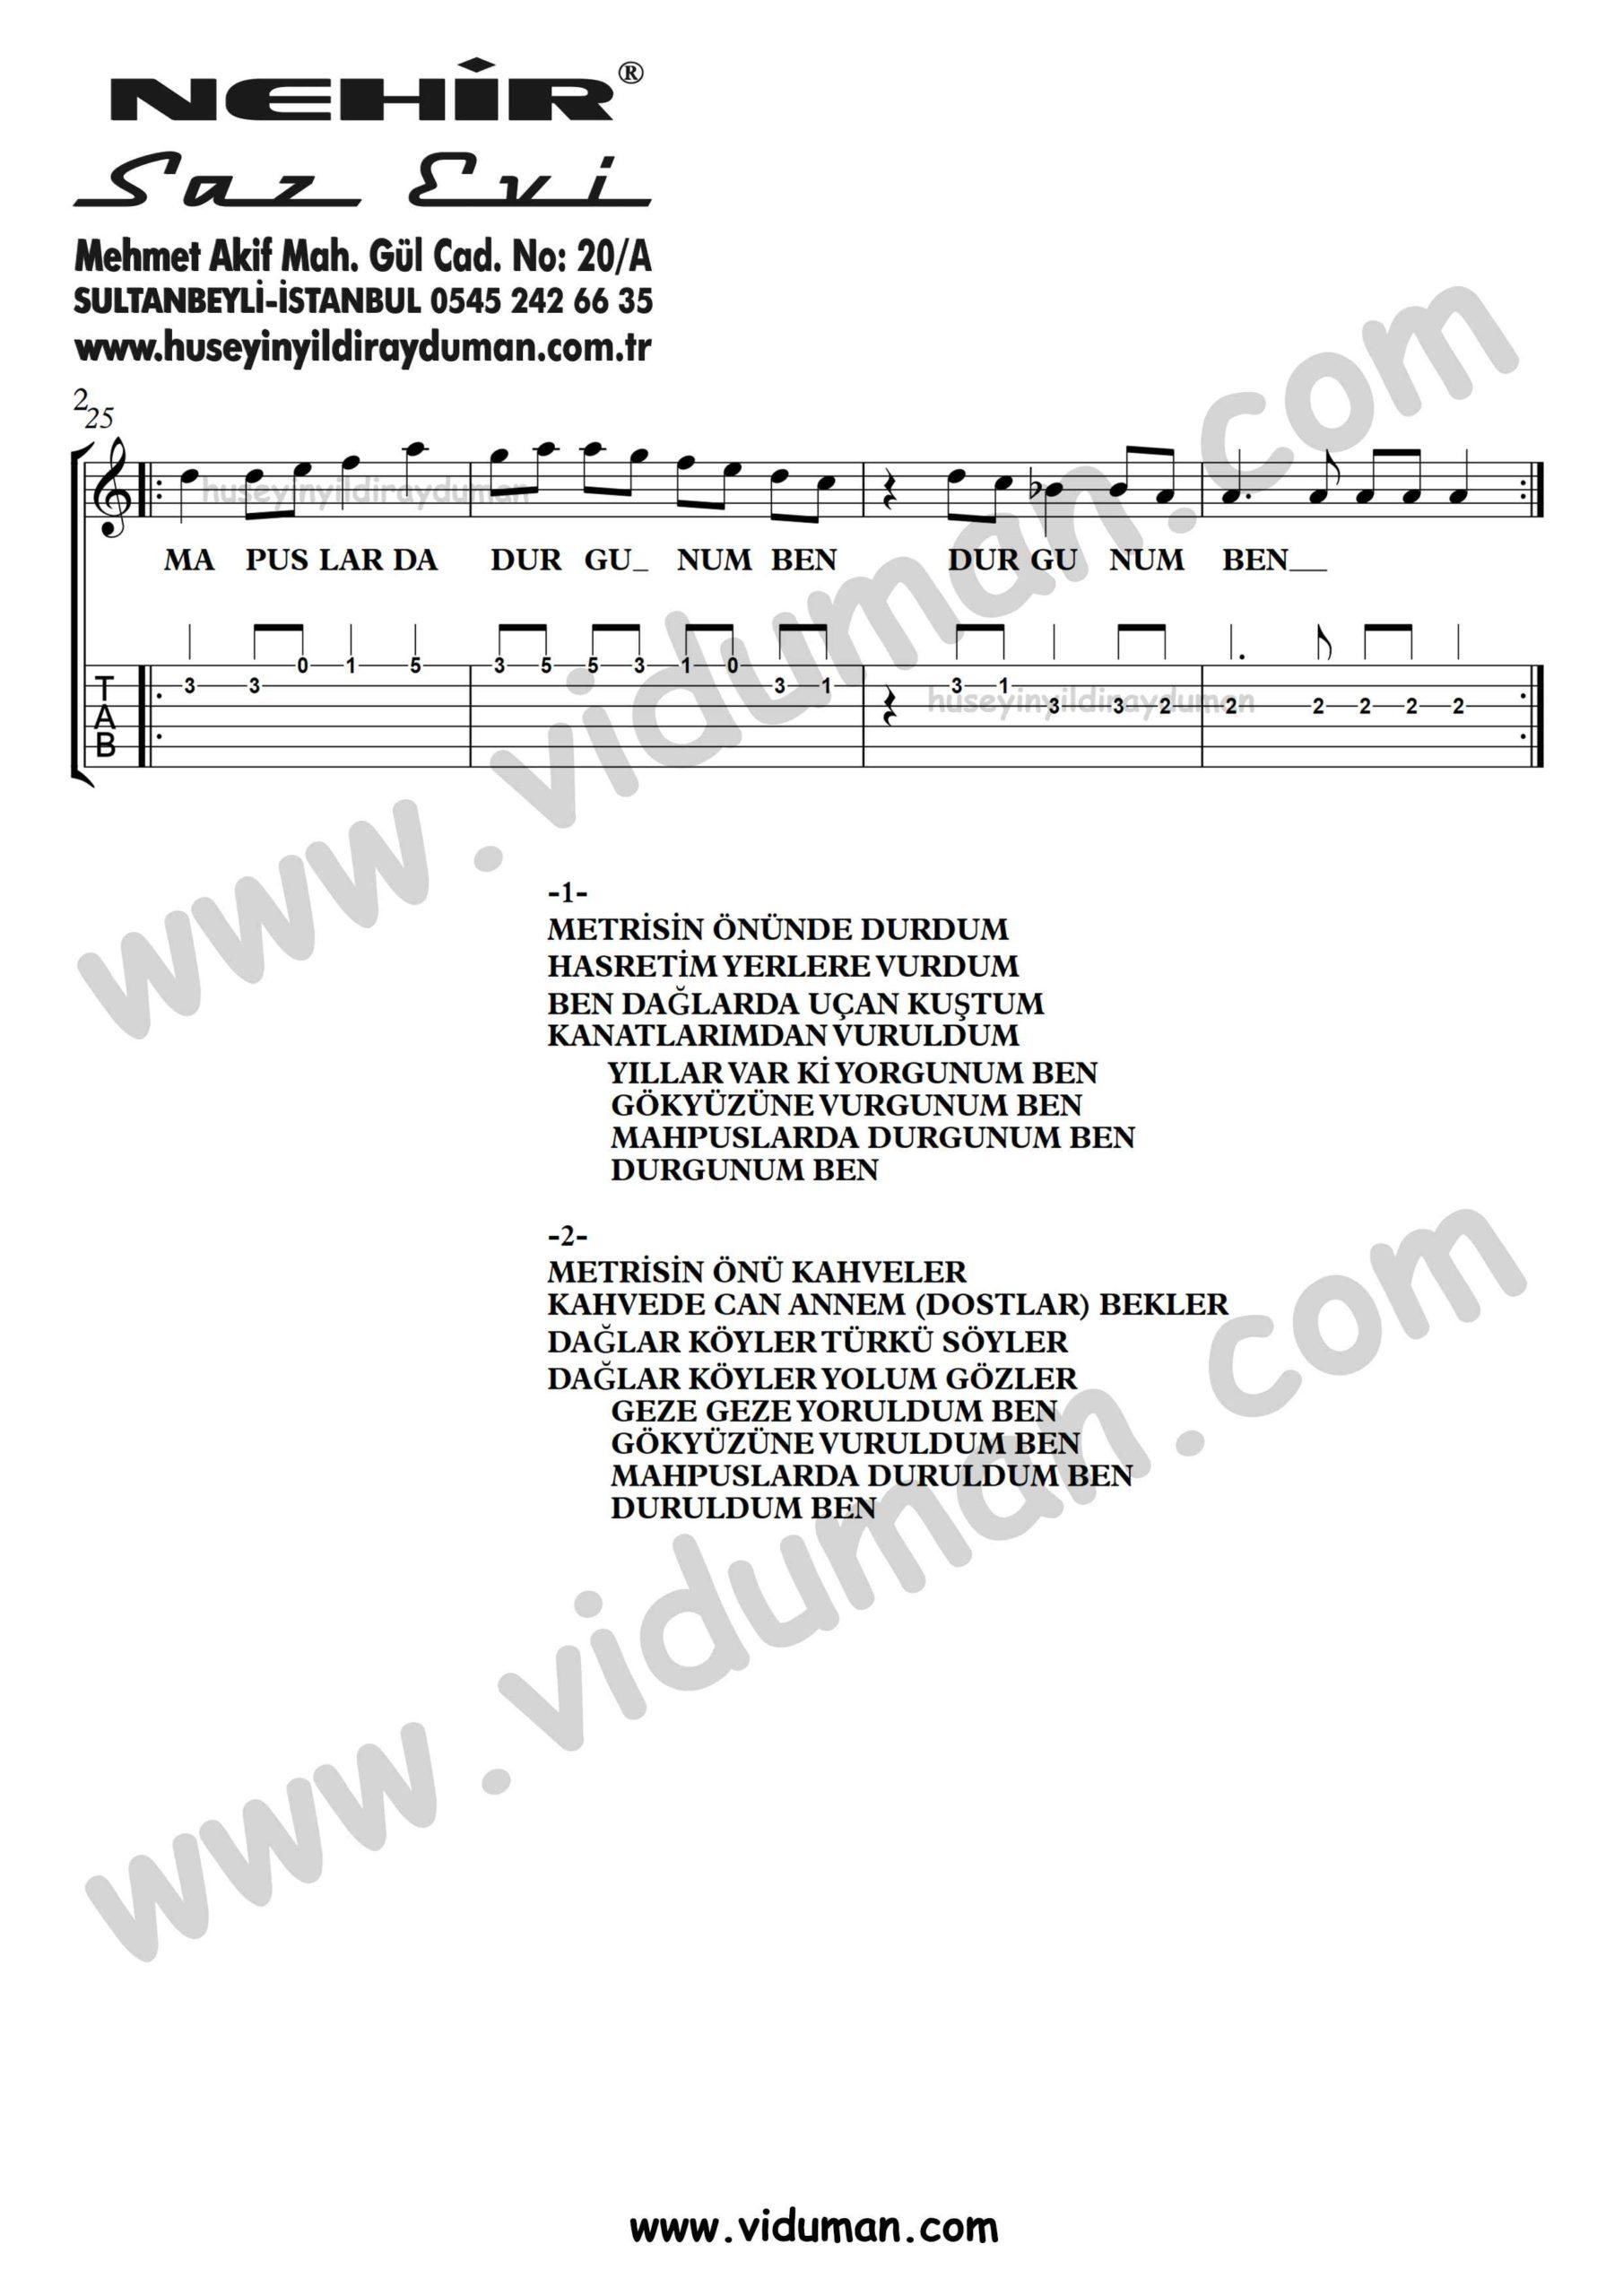 Metrisin Onunde Durdum_2-Ahmet Kaya-Gitar Tab-Solo Notalari